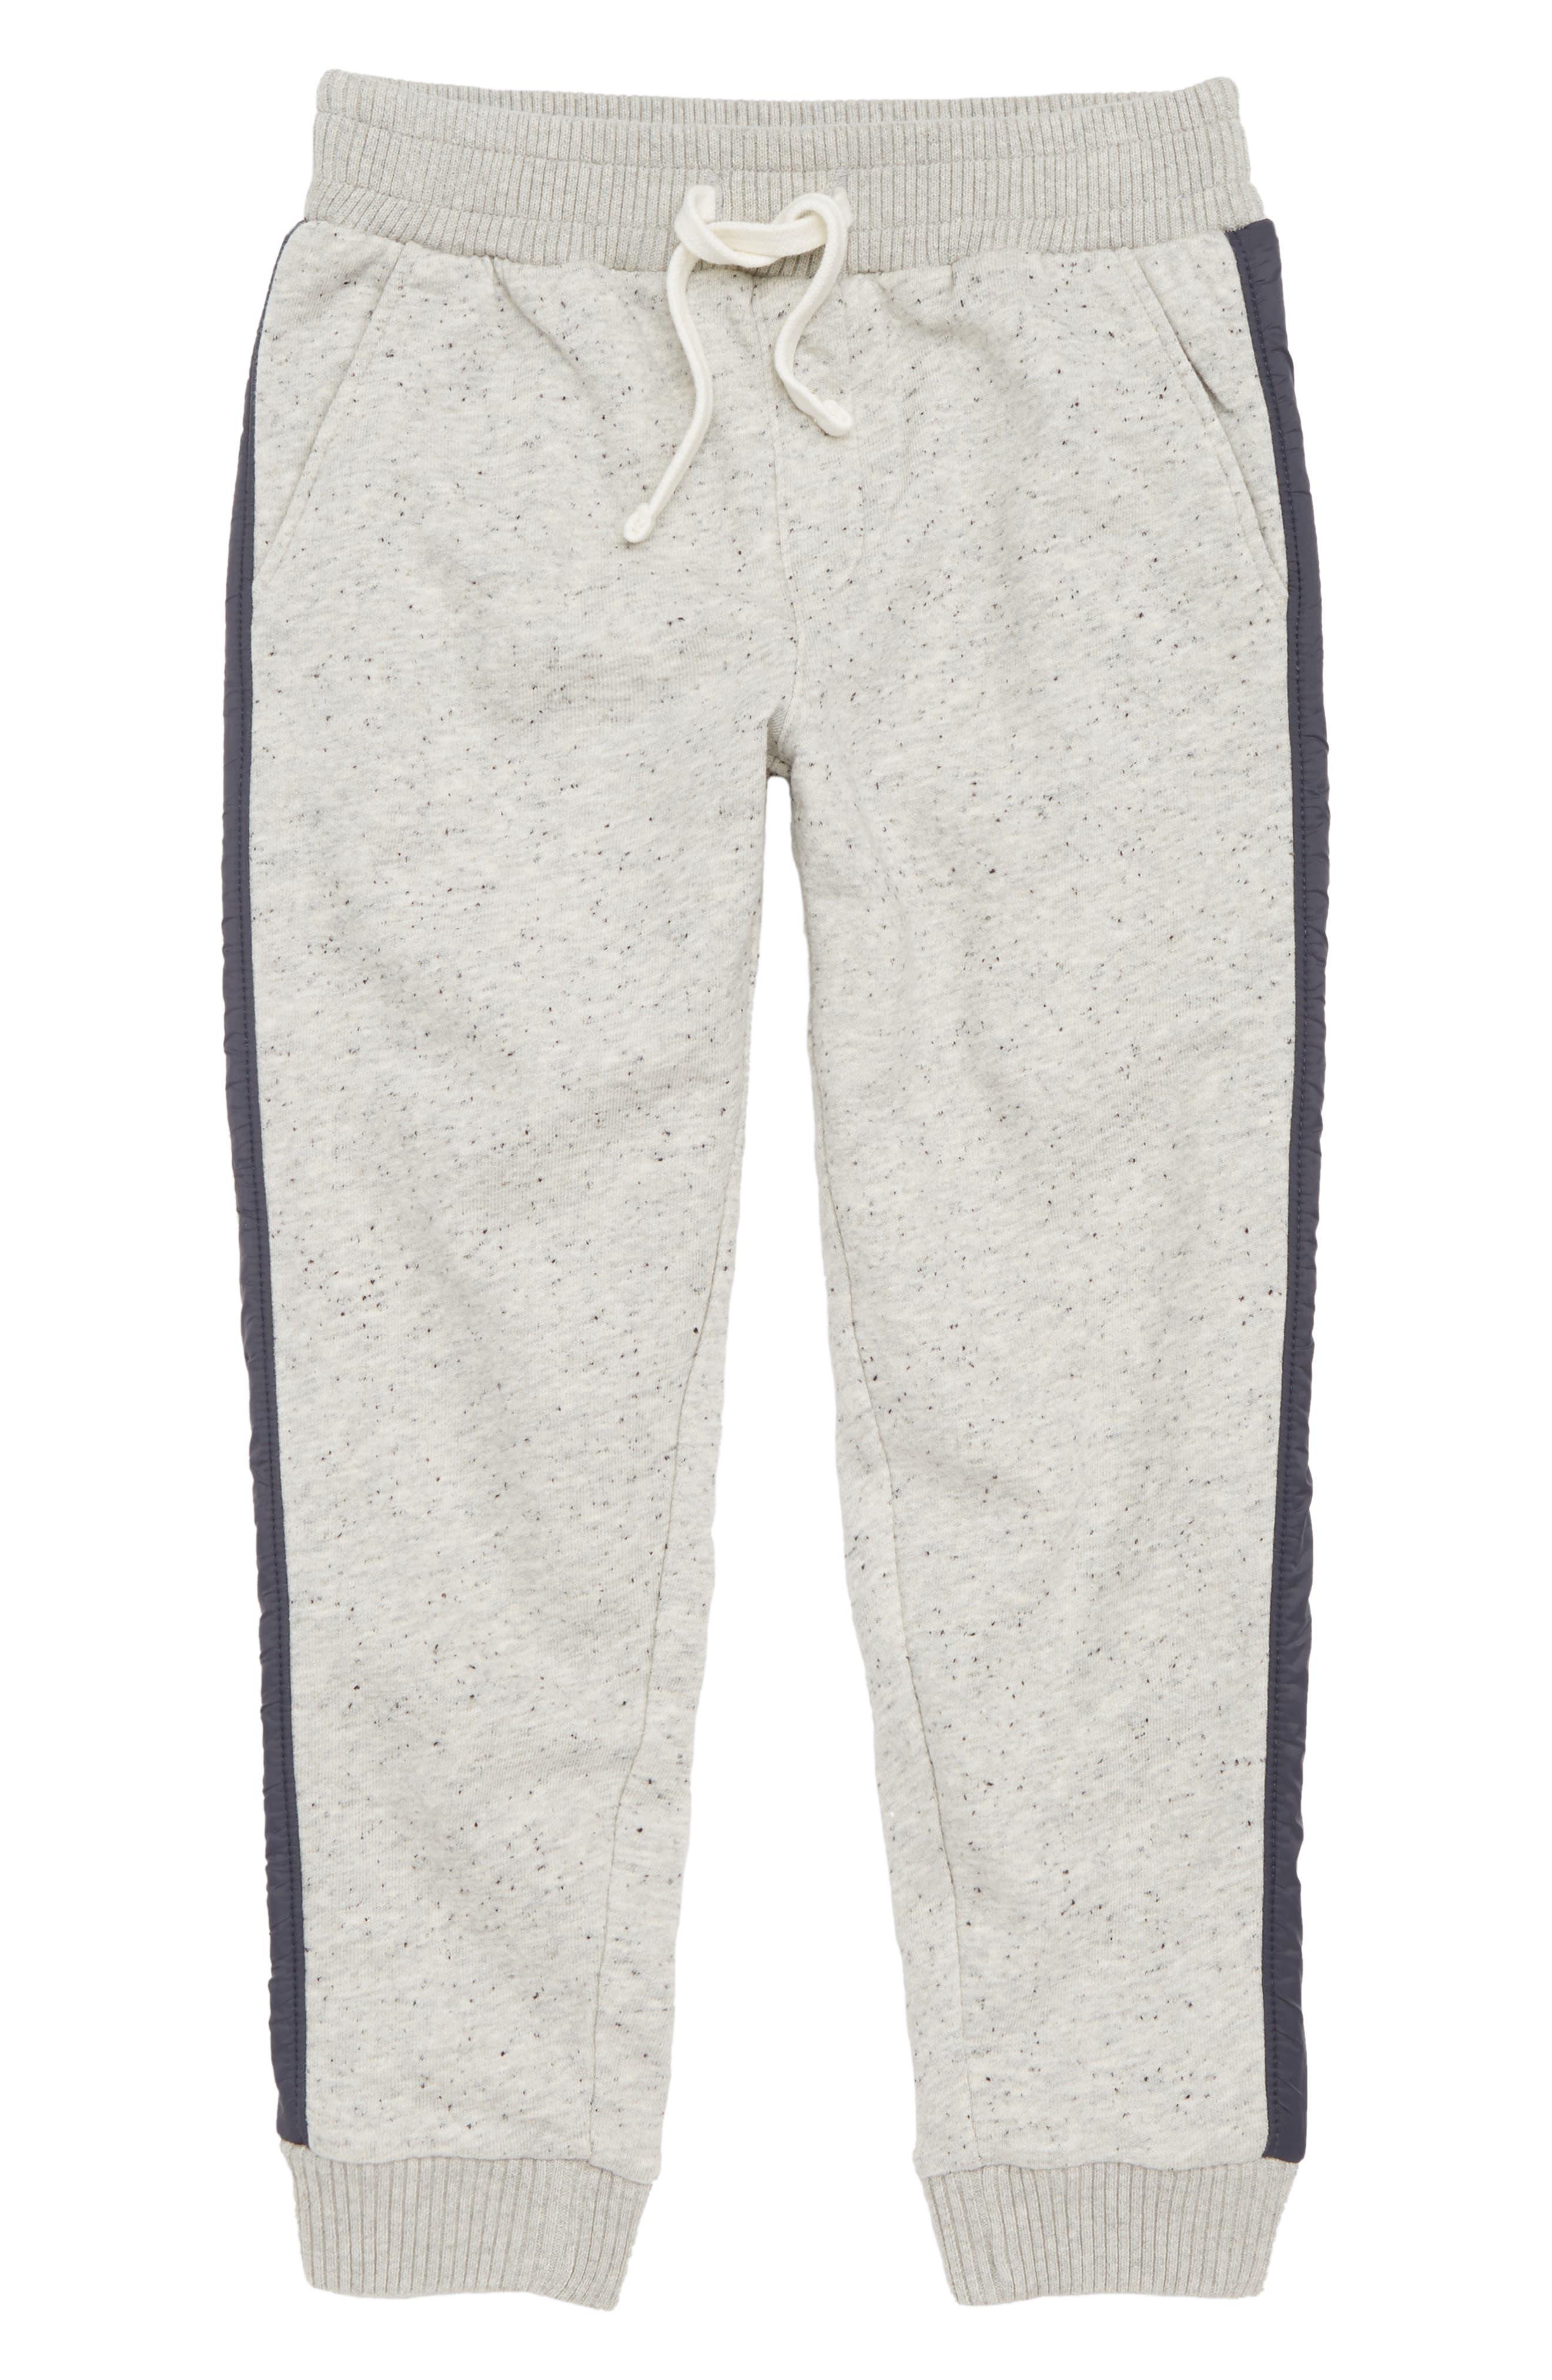 Toddler Boys Tucker  Tate Fleece Sweatpants Size 3T  Grey